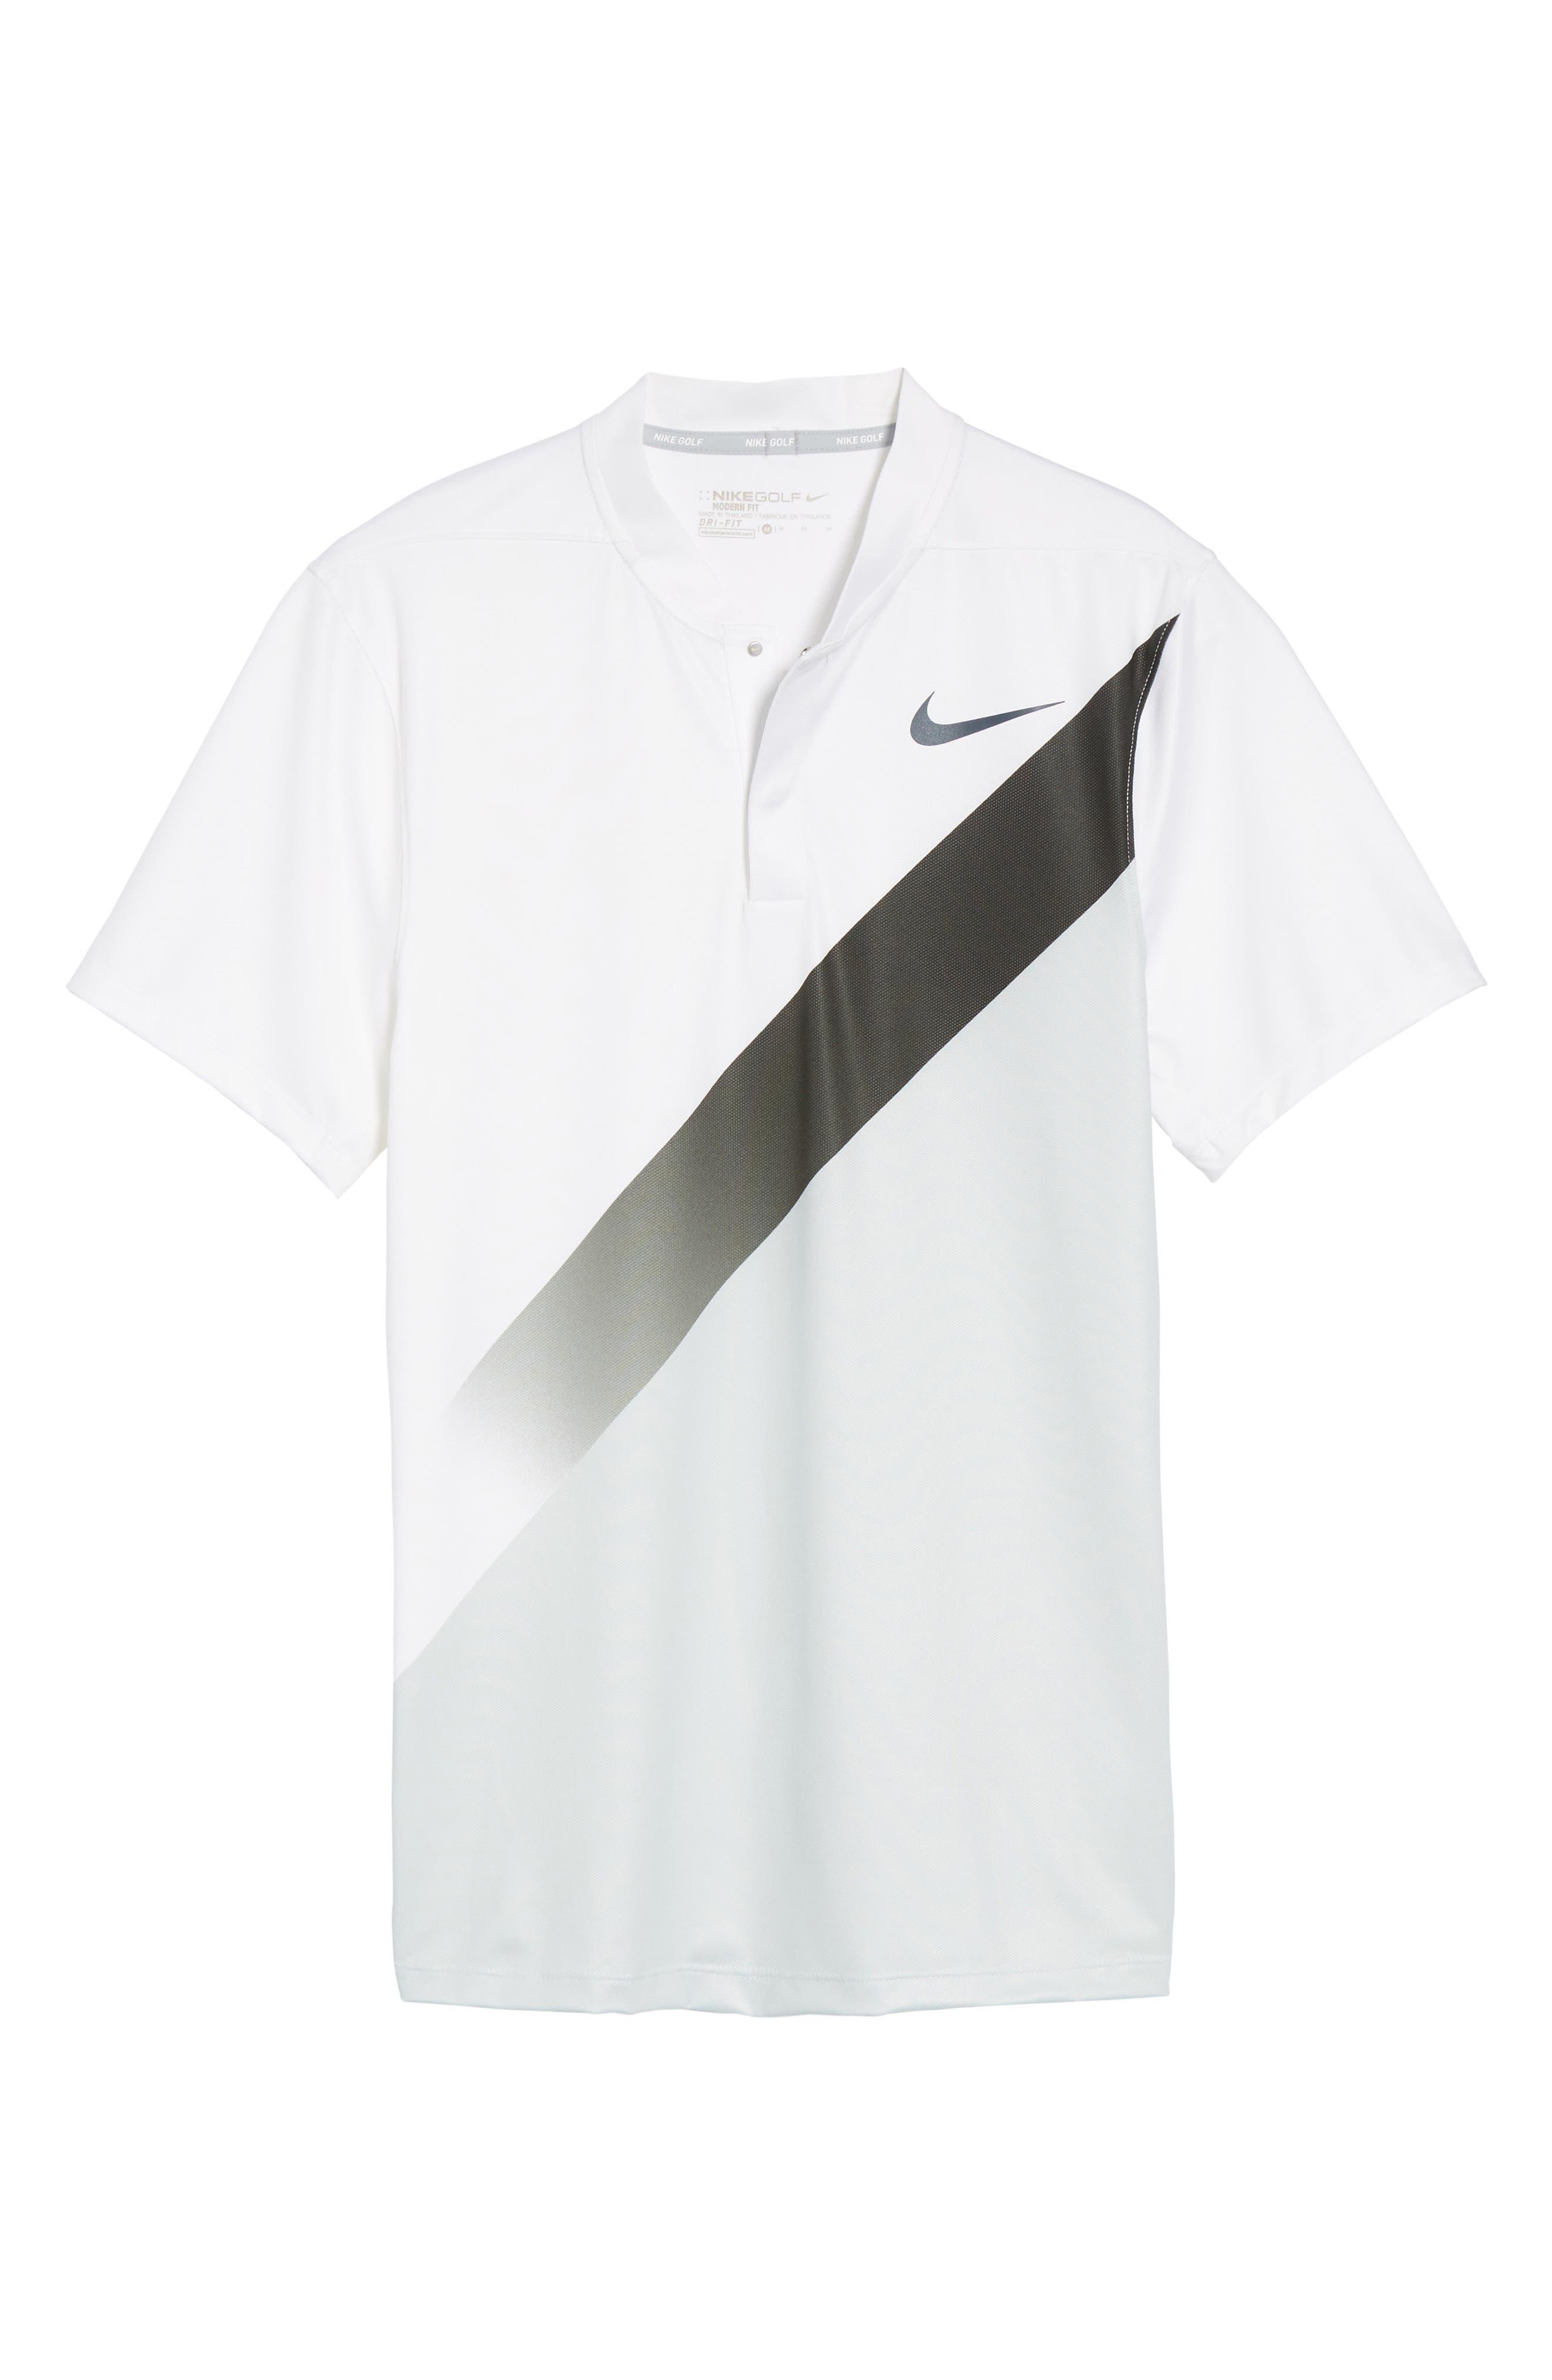 Dry Golf Polo,                             Alternate thumbnail 6, color,                             White/ Platinum/ Black/ Black